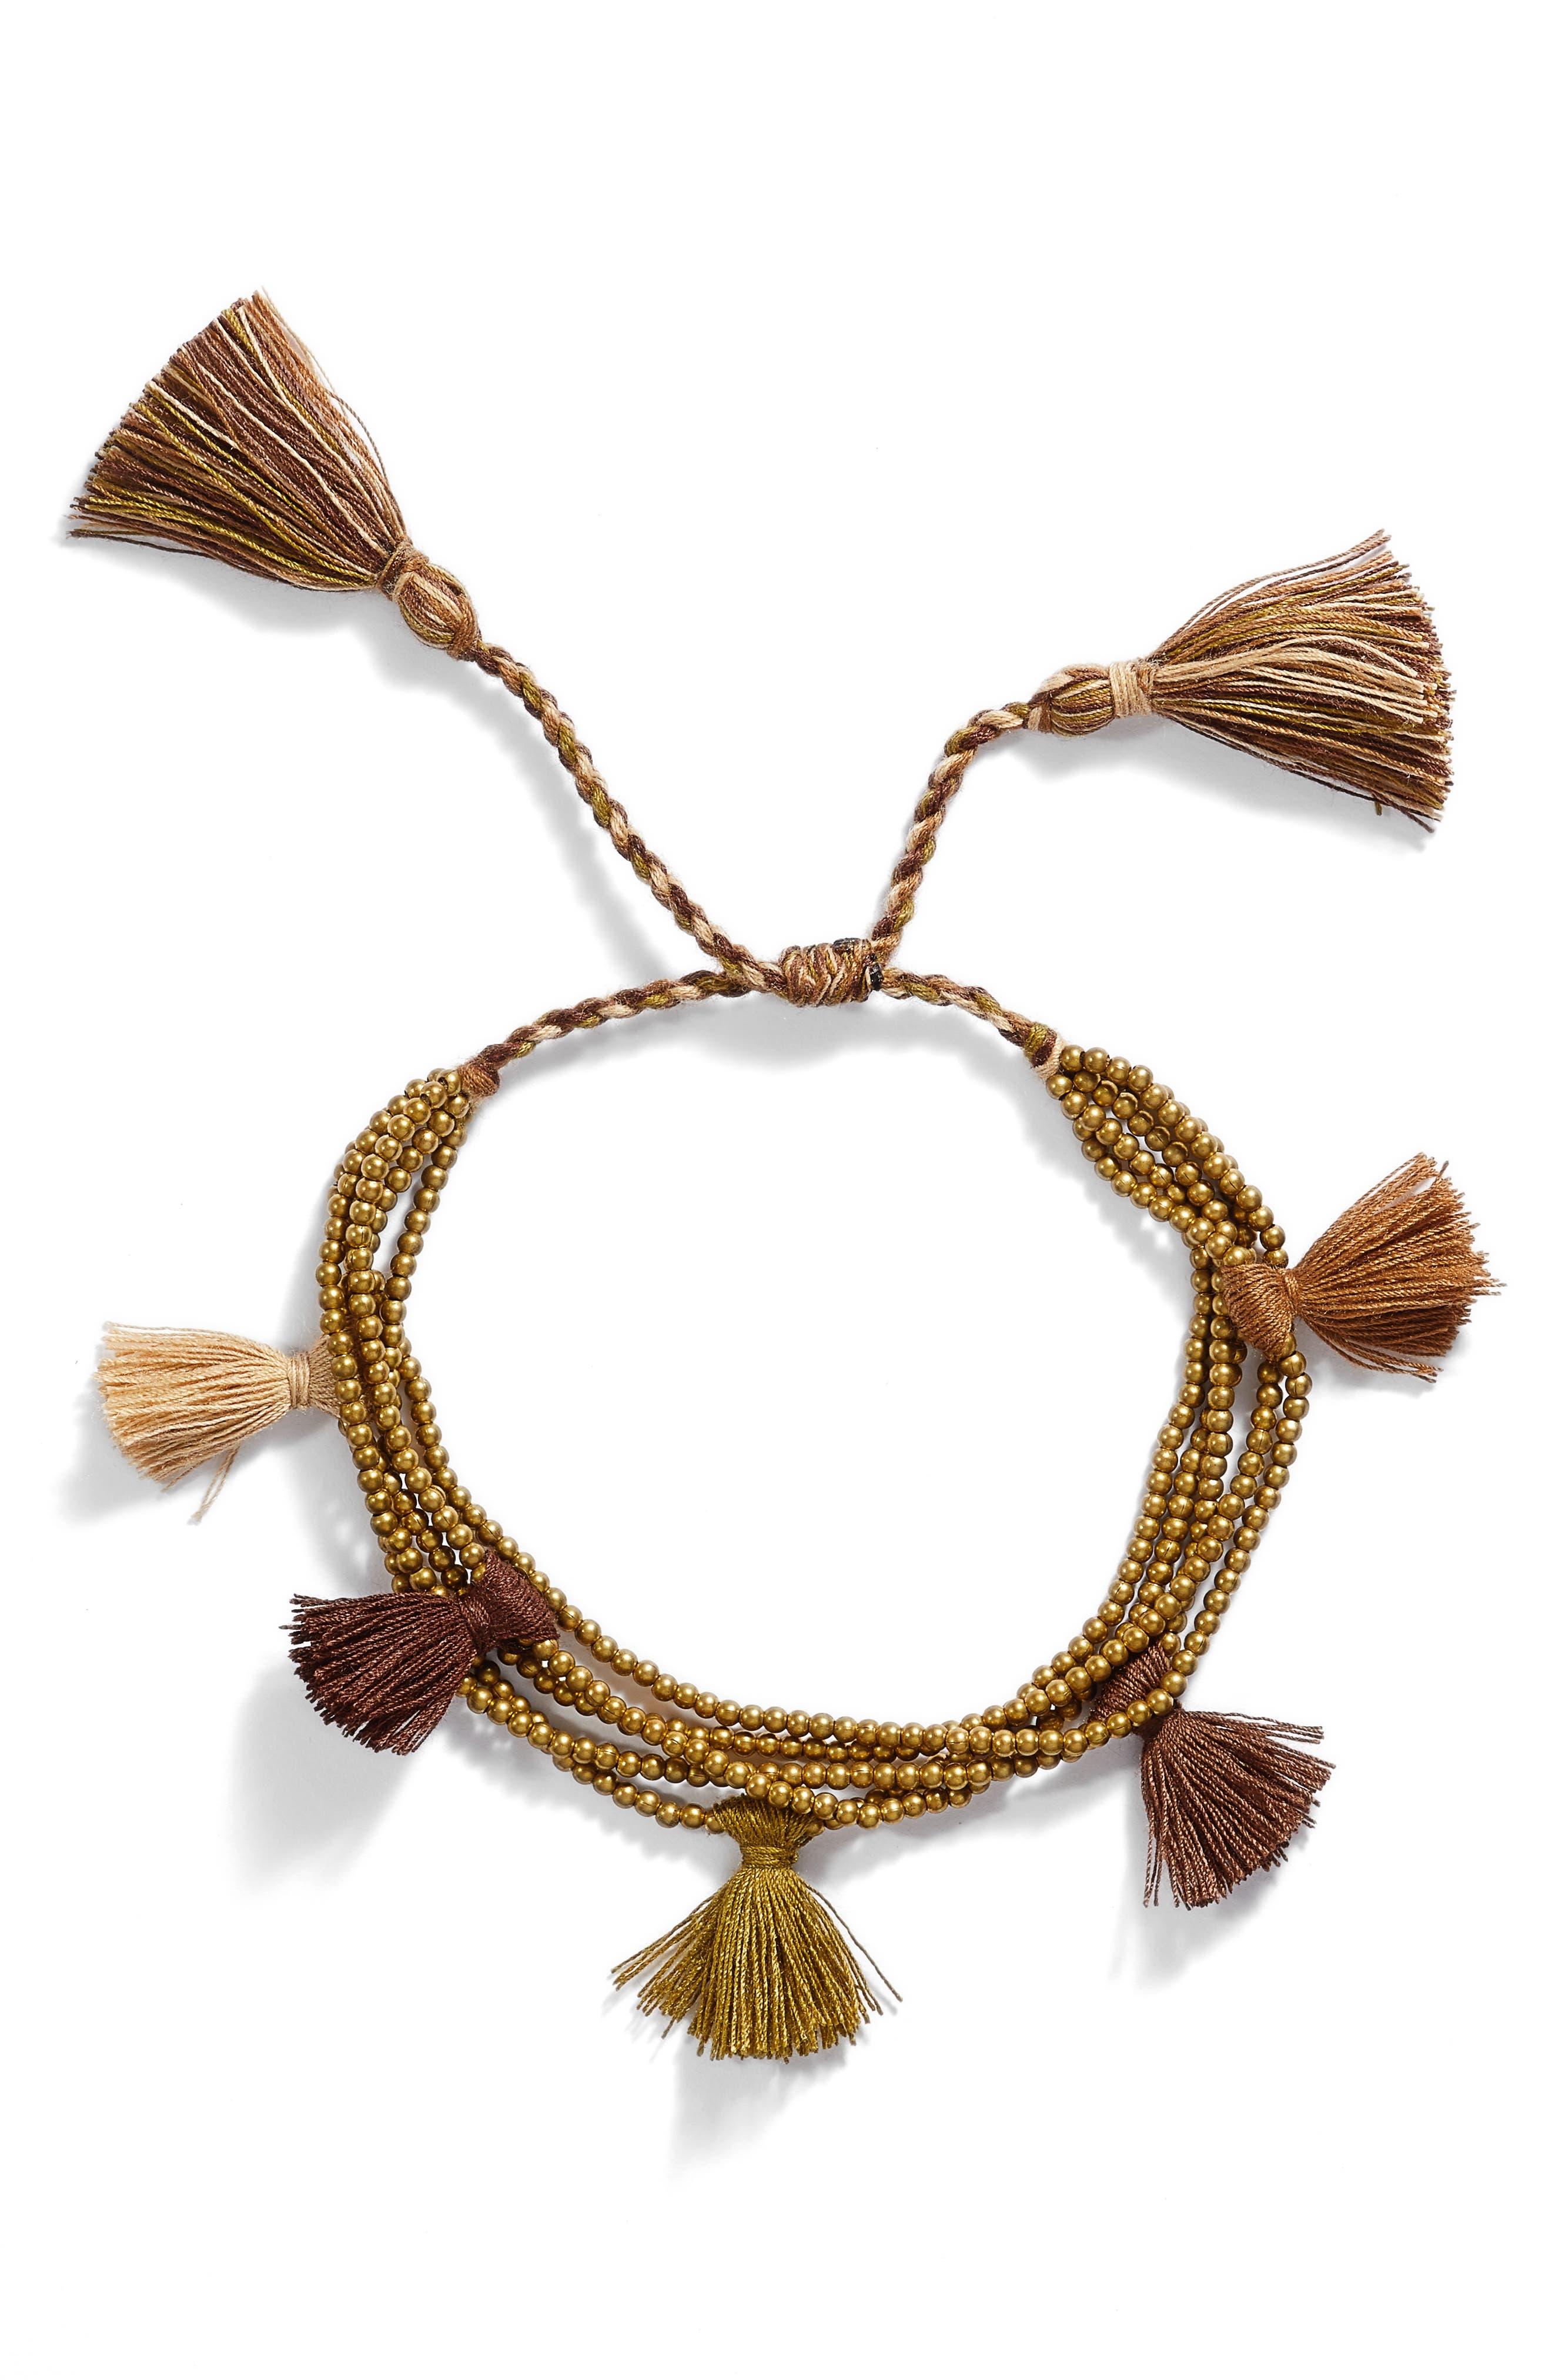 Dacing Tassel Bracelet,                             Main thumbnail 1, color,                             250